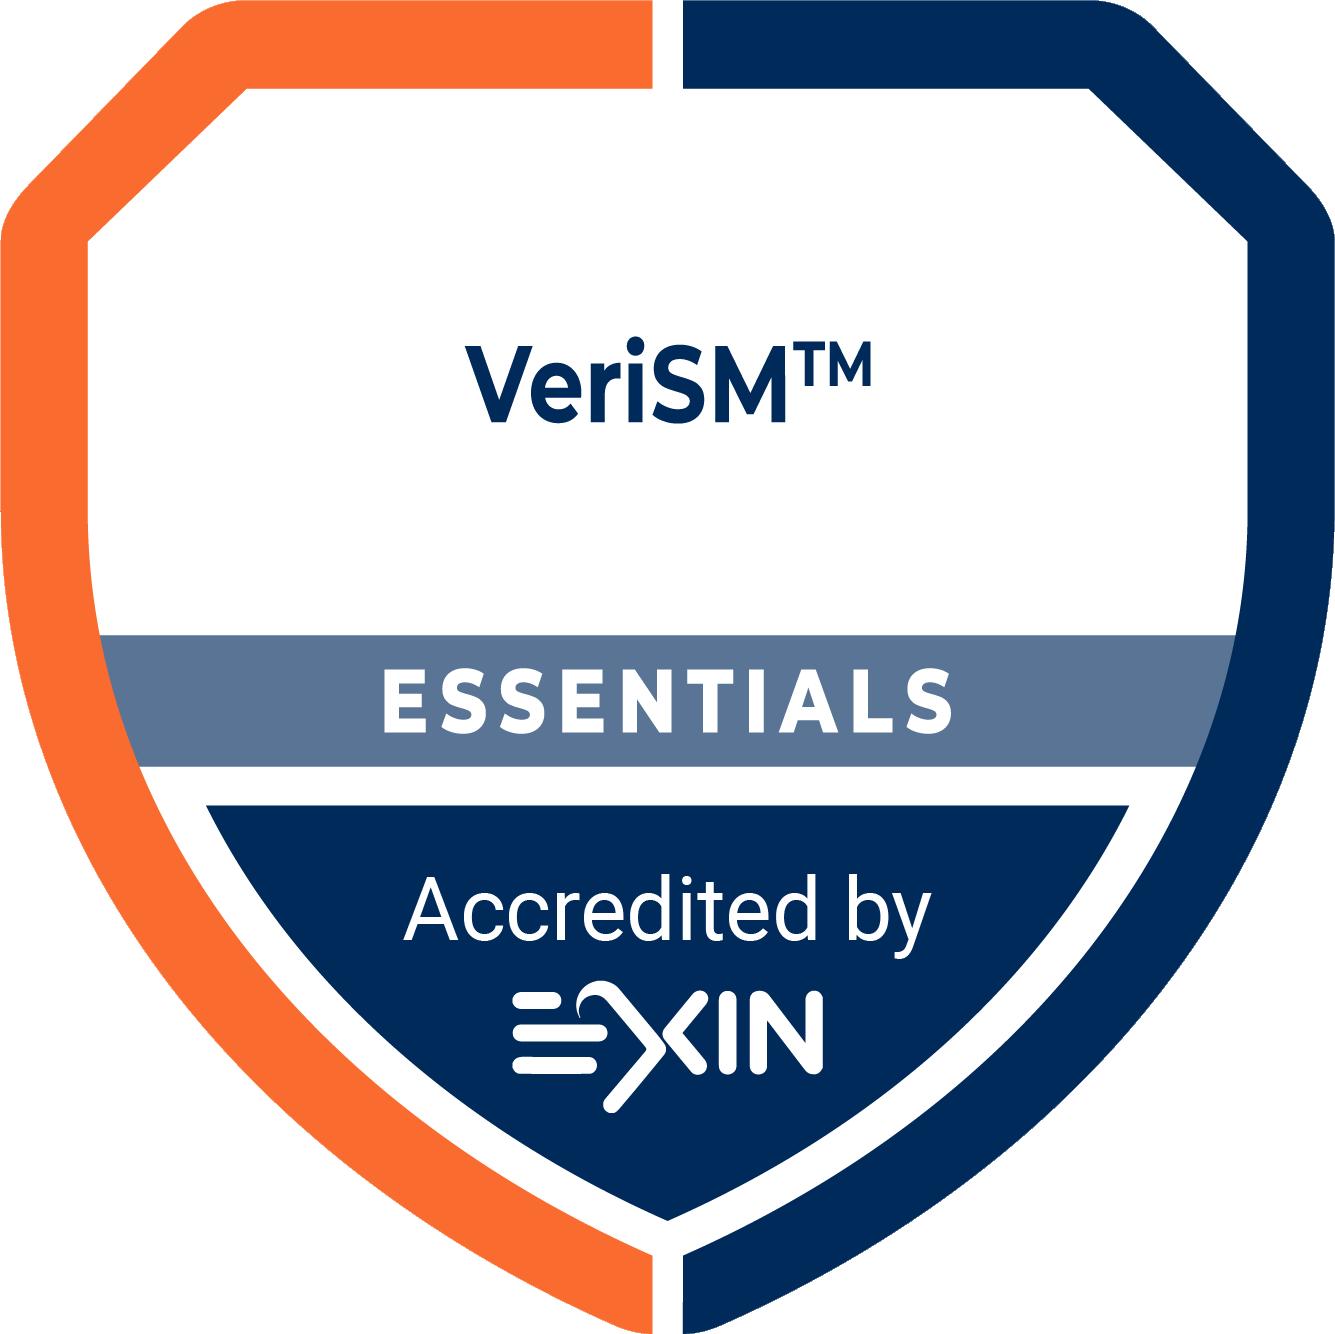 Accreditation Logo VeriSM Essentials